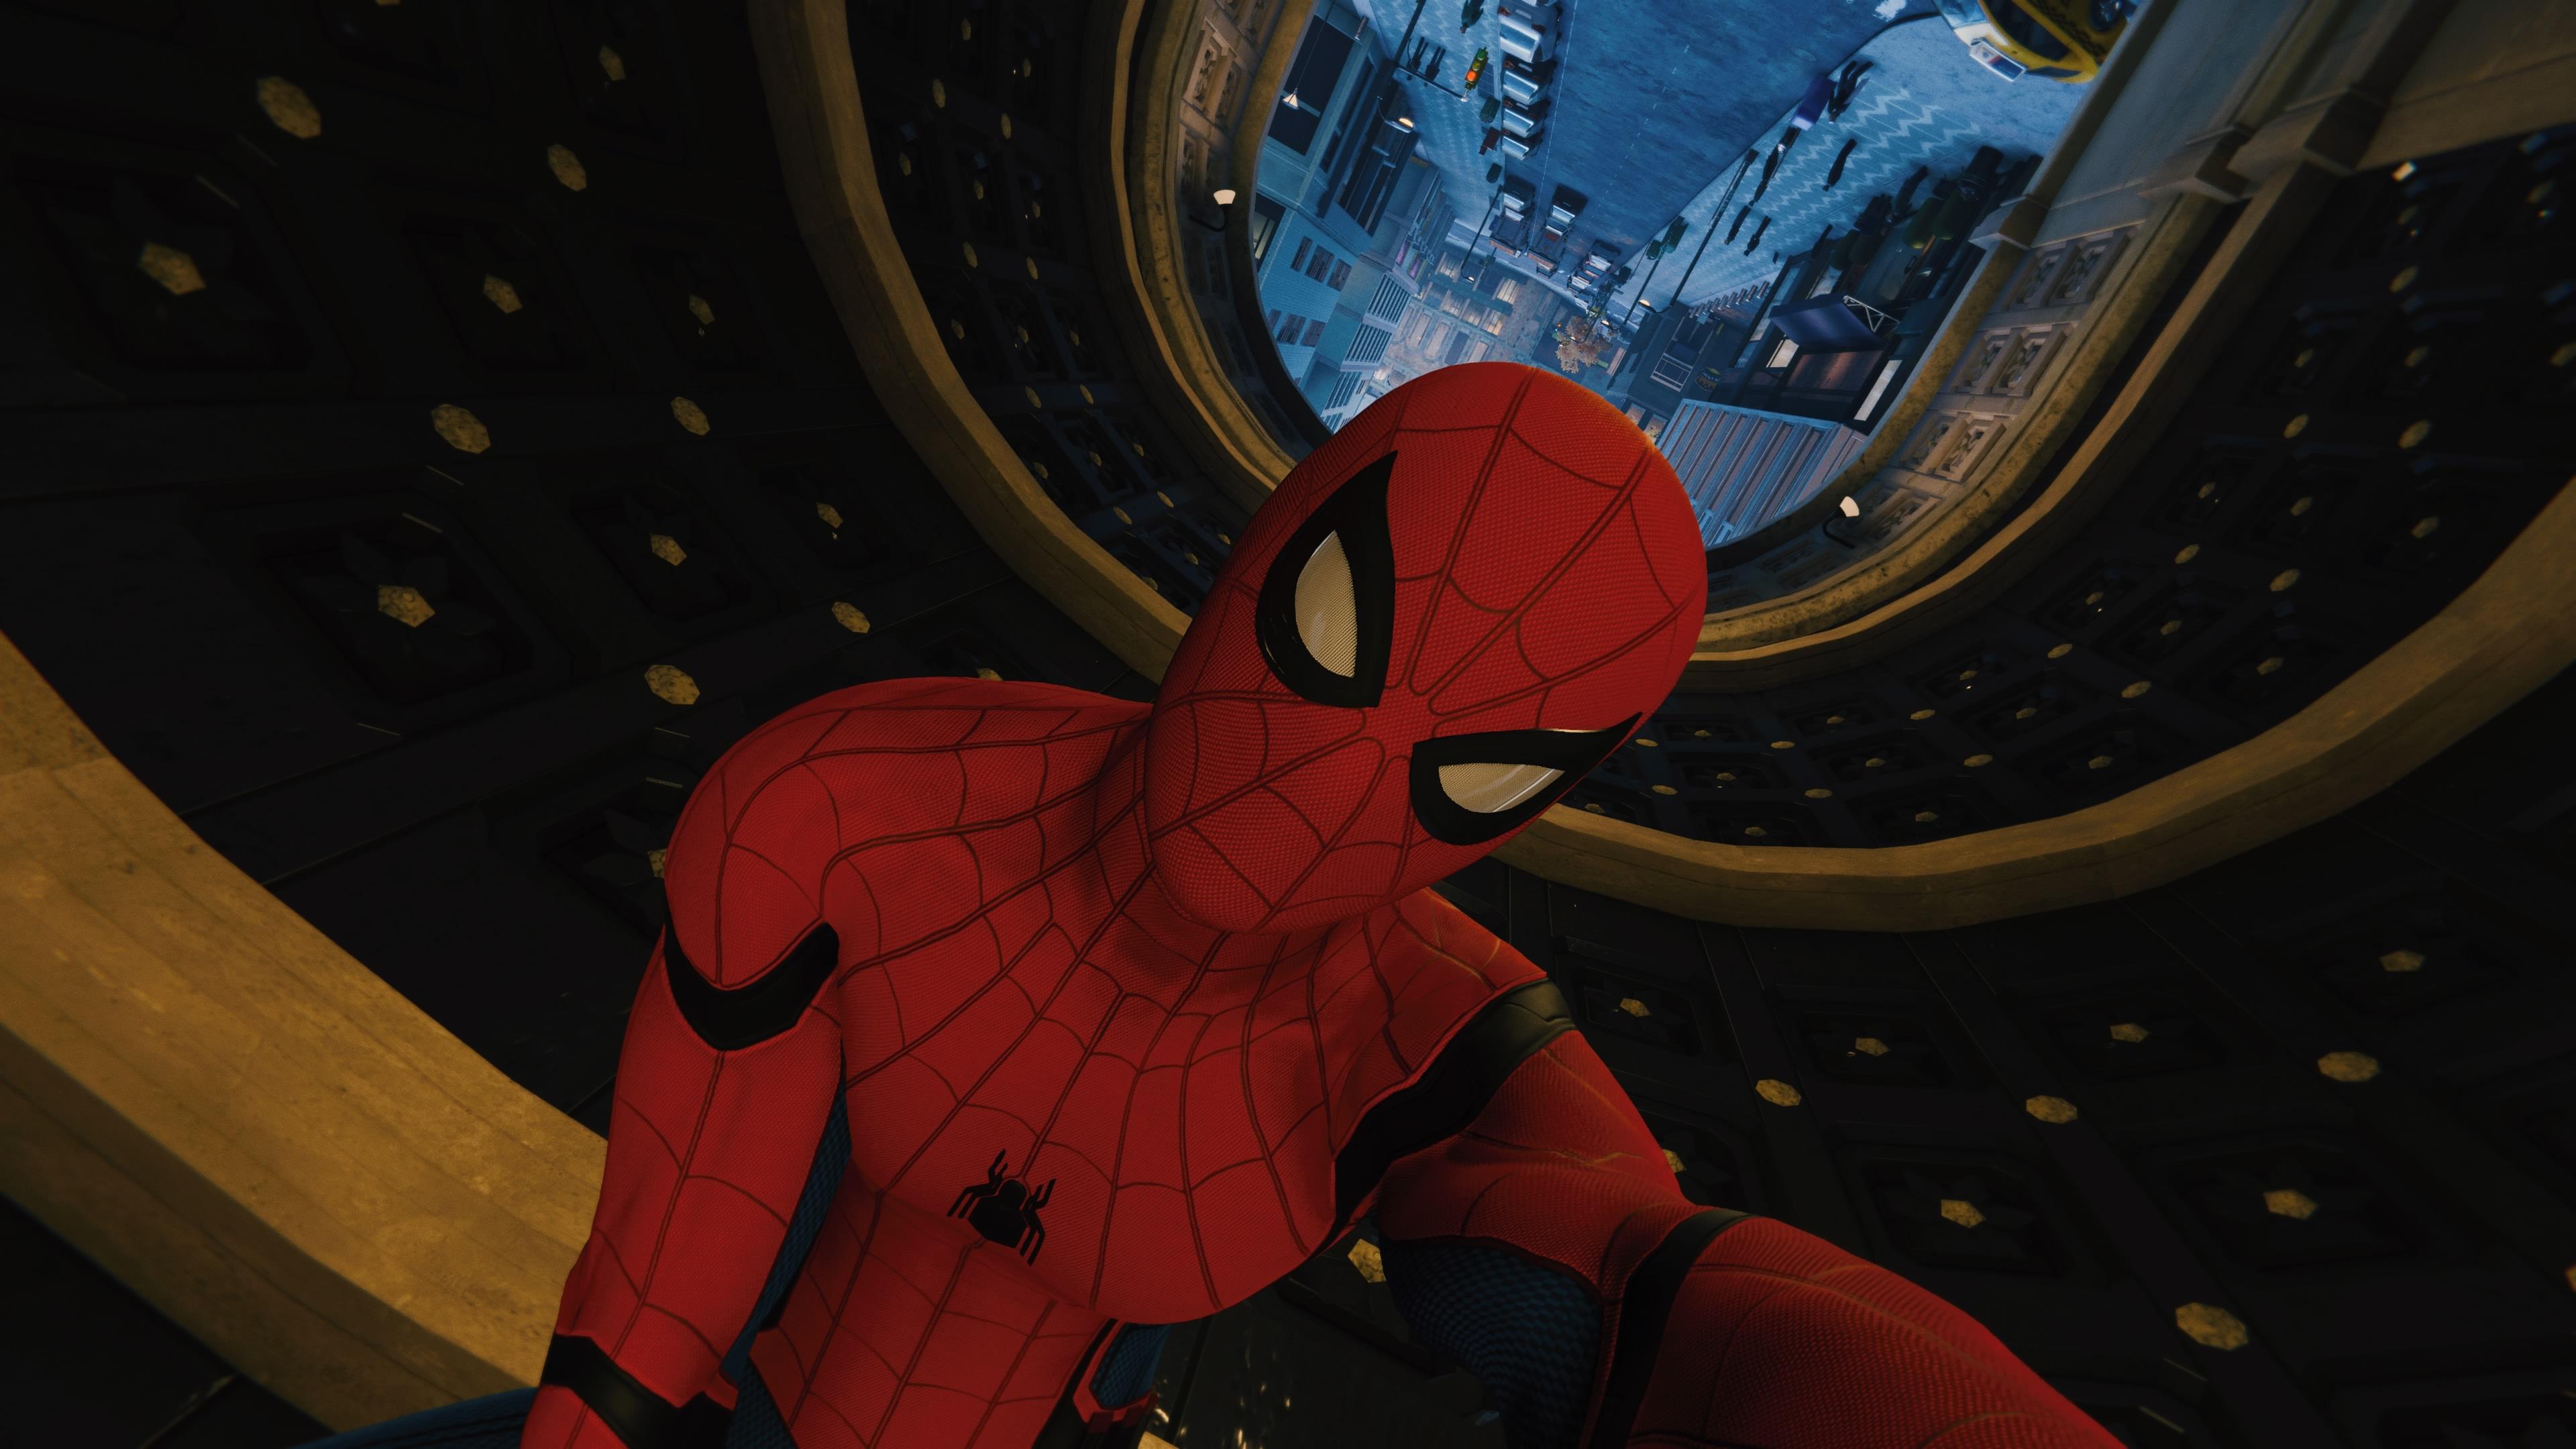 Marvels-Spider-Man_vistazo-a-fondo-calle